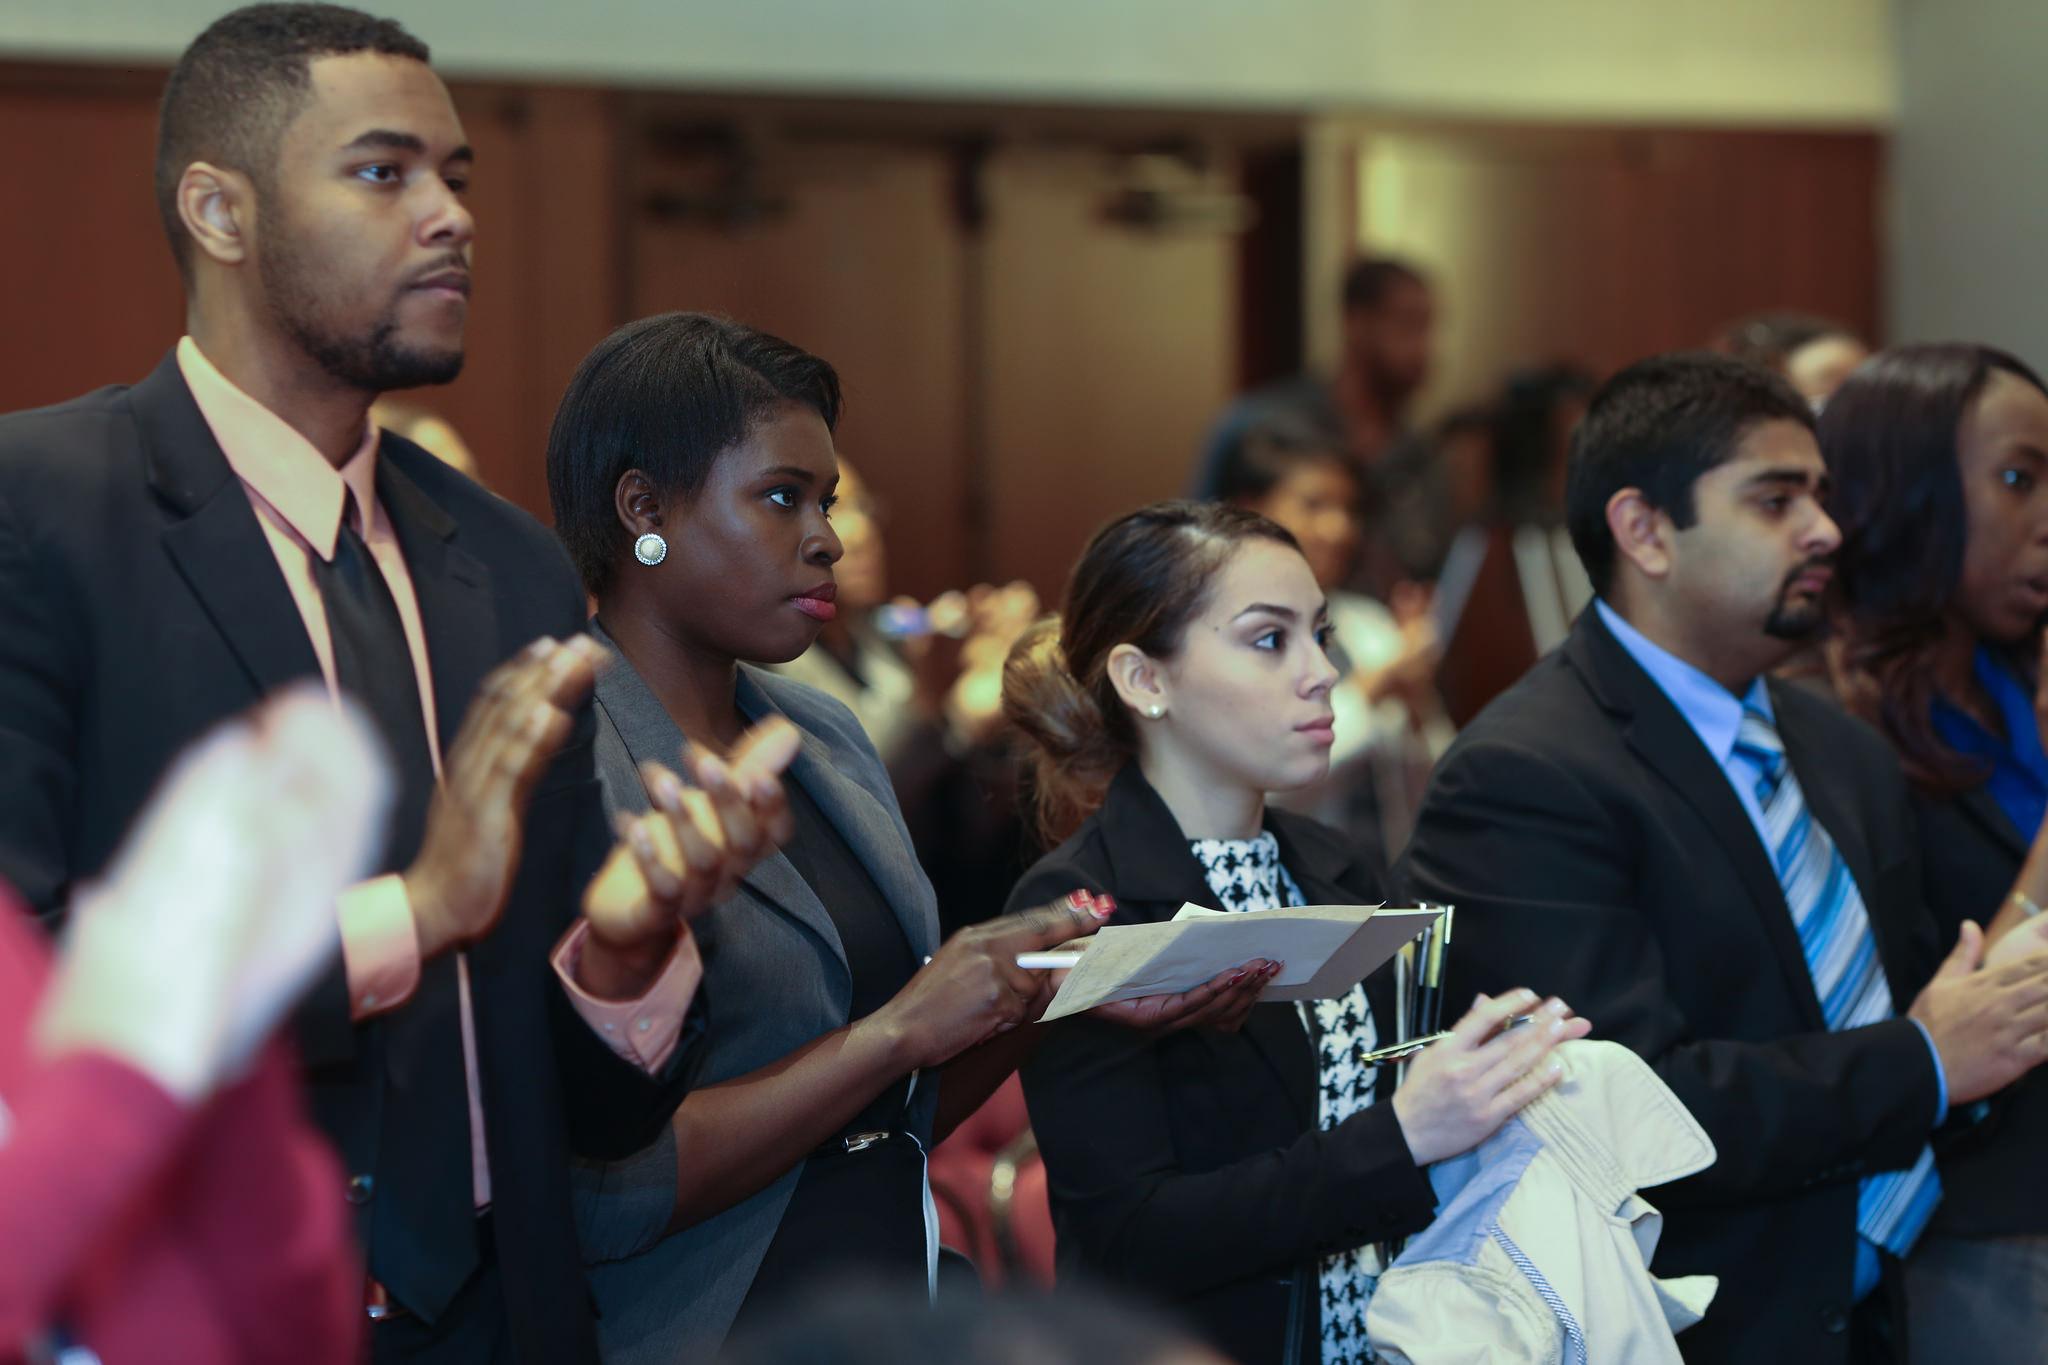 Aspiring lawyers at plenary session